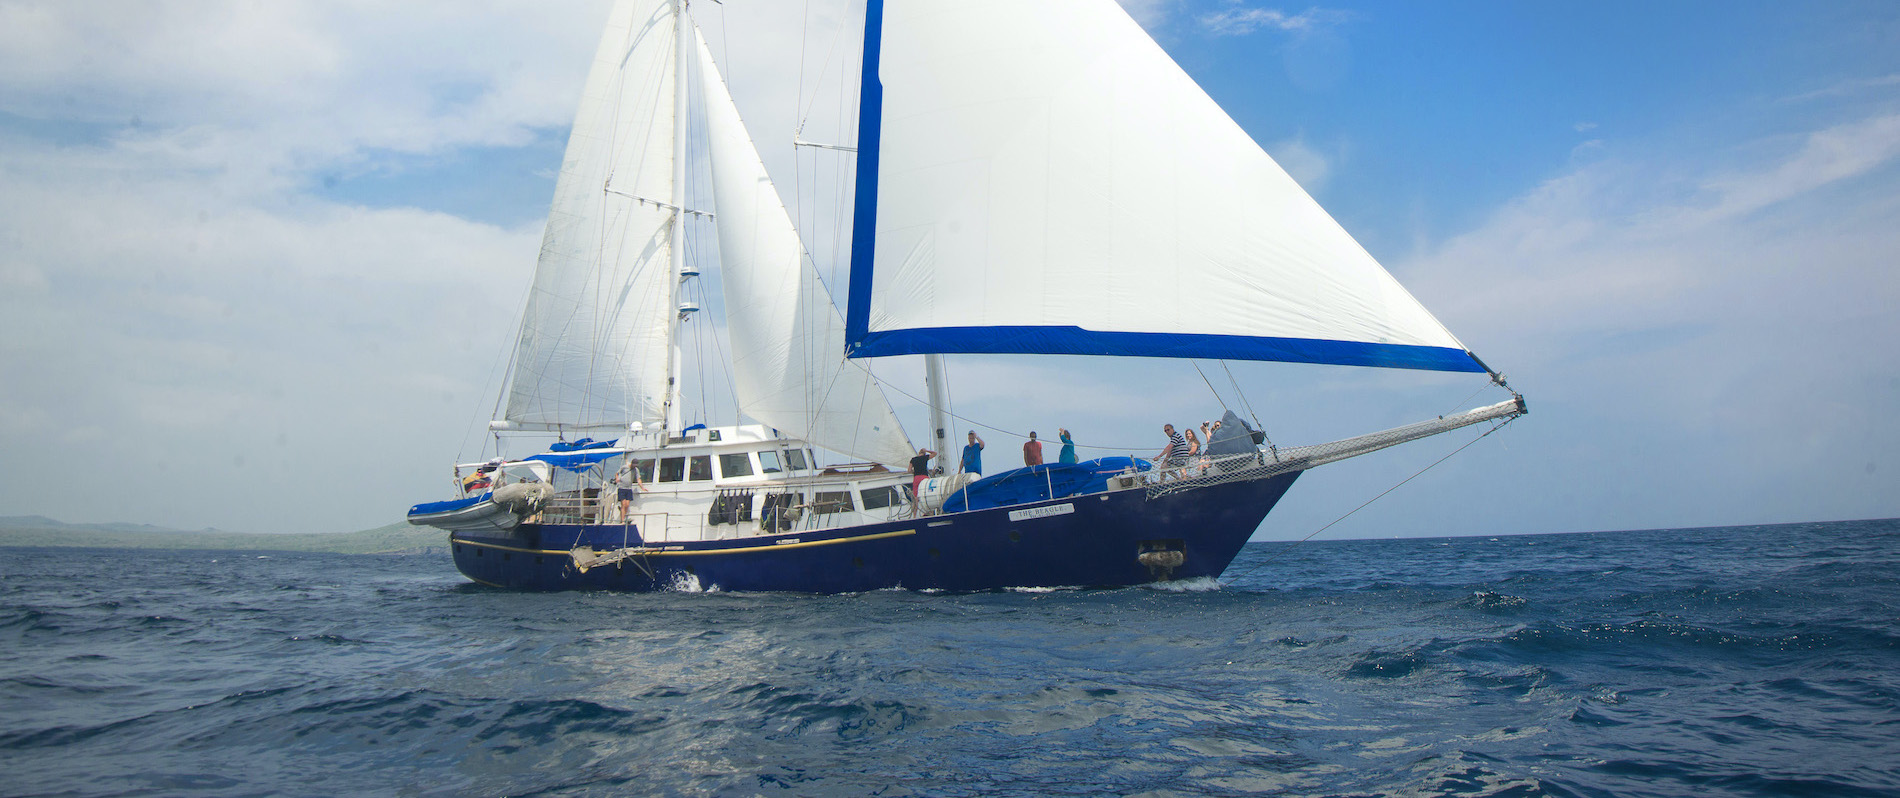 M/S Beagle Sailor Yacht